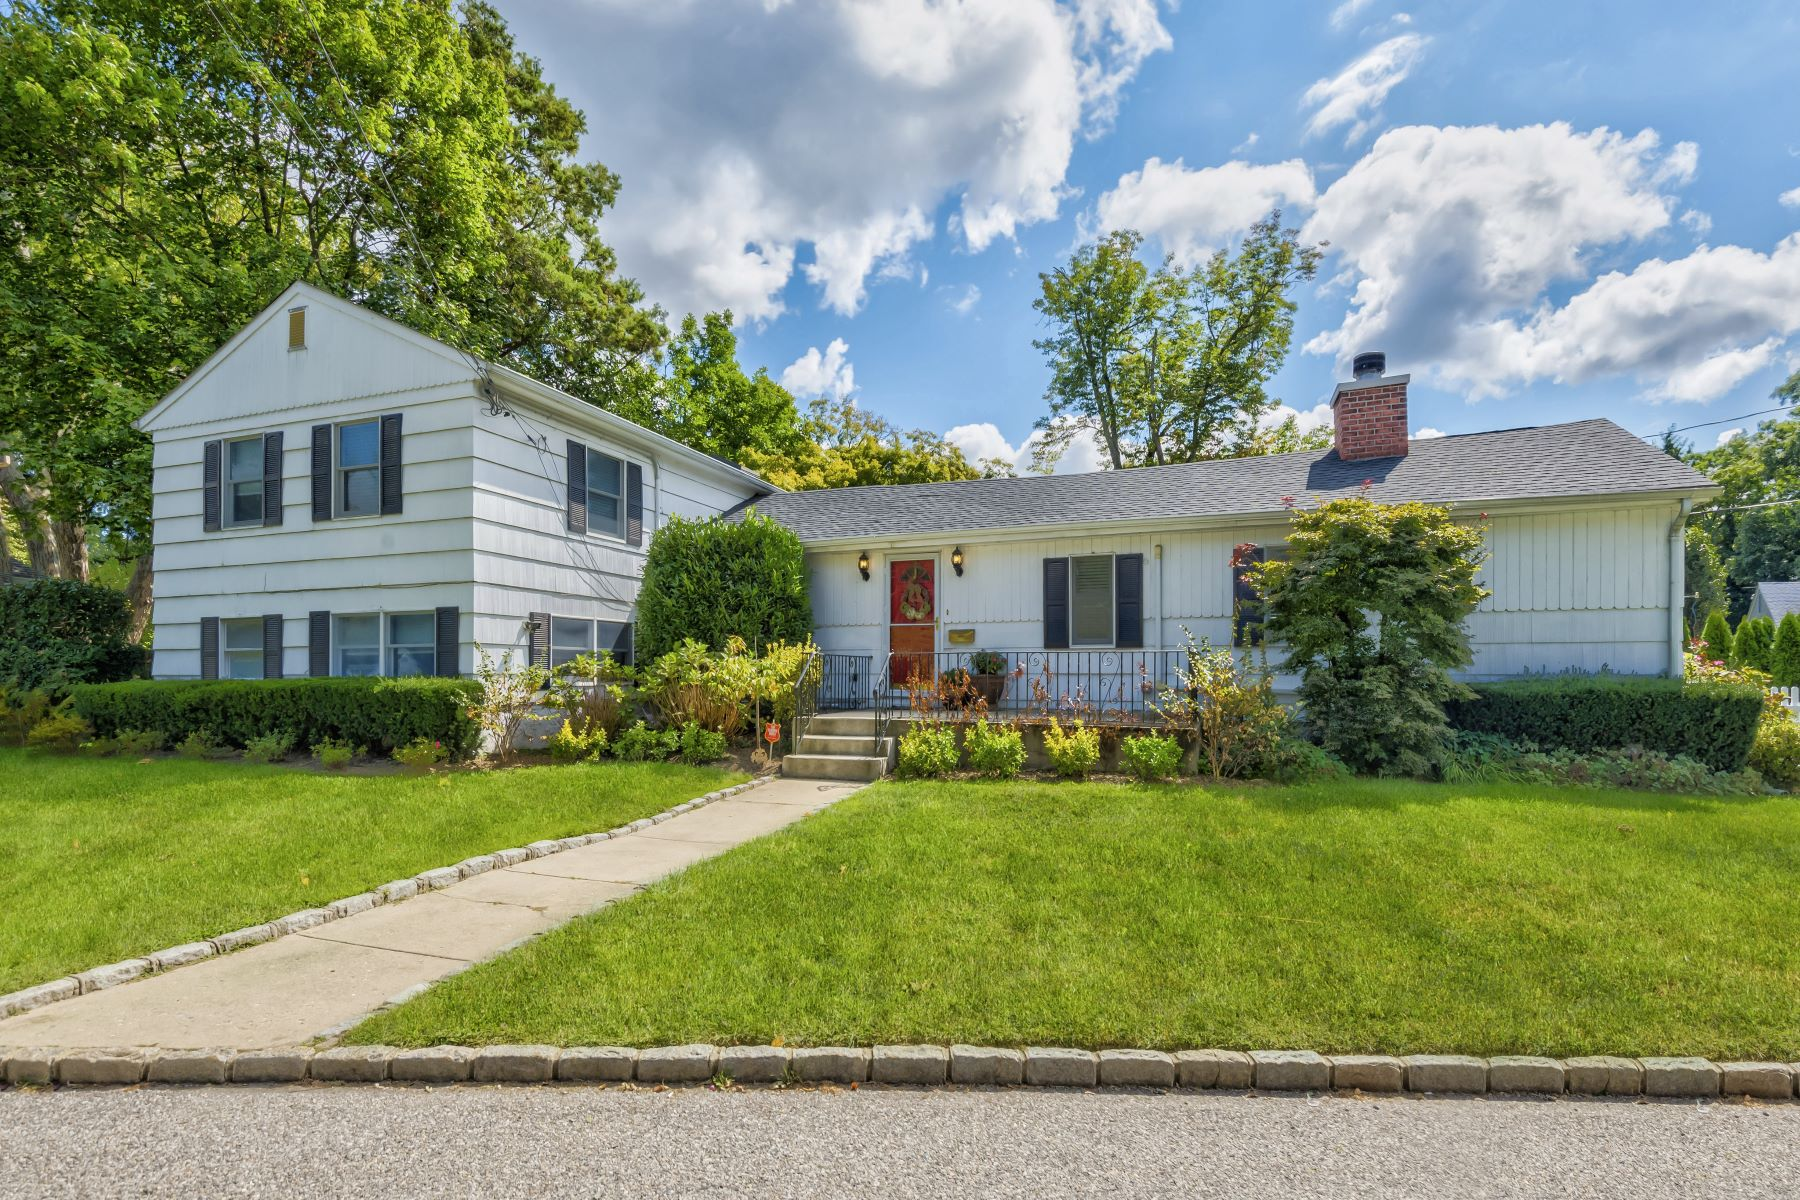 Single Family Homes for Active at Glen Head 56 Glen Cove Drive Glen Head, New York 11545 United States